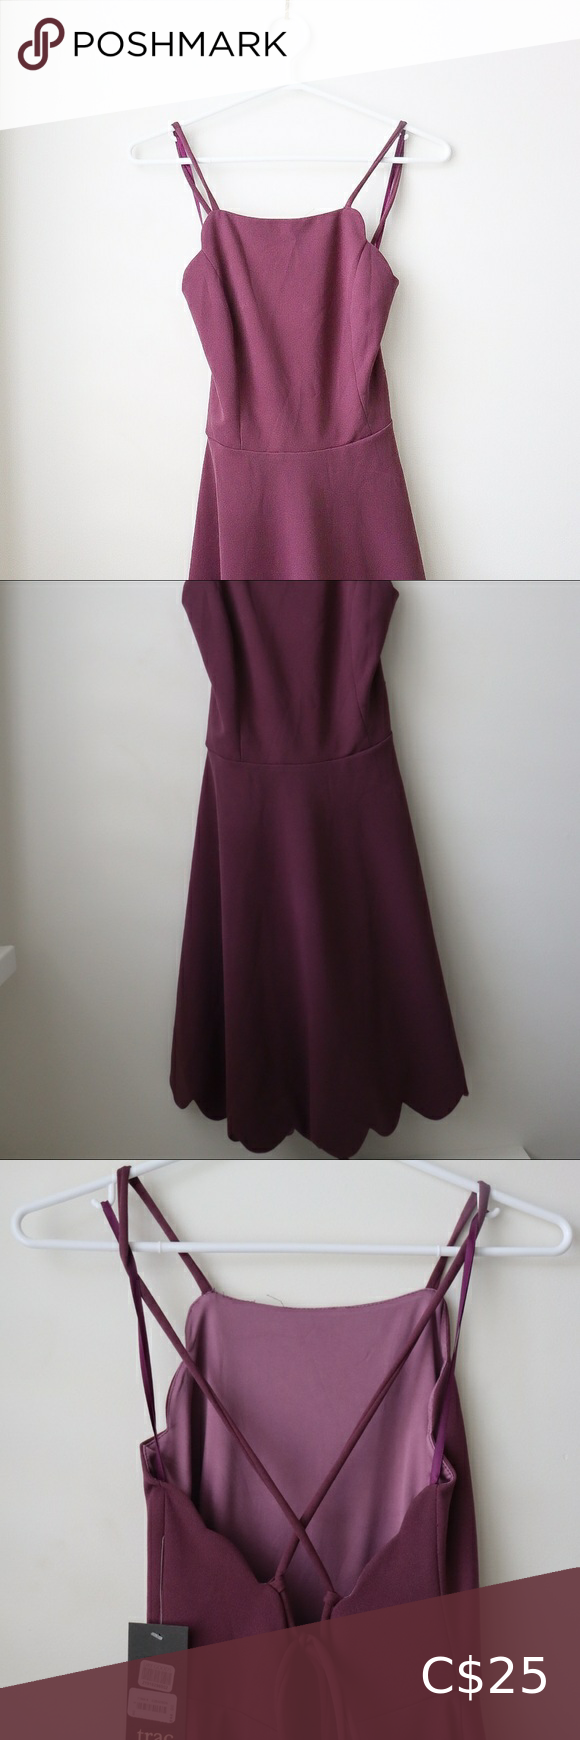 45++ Dry goods dress ideas